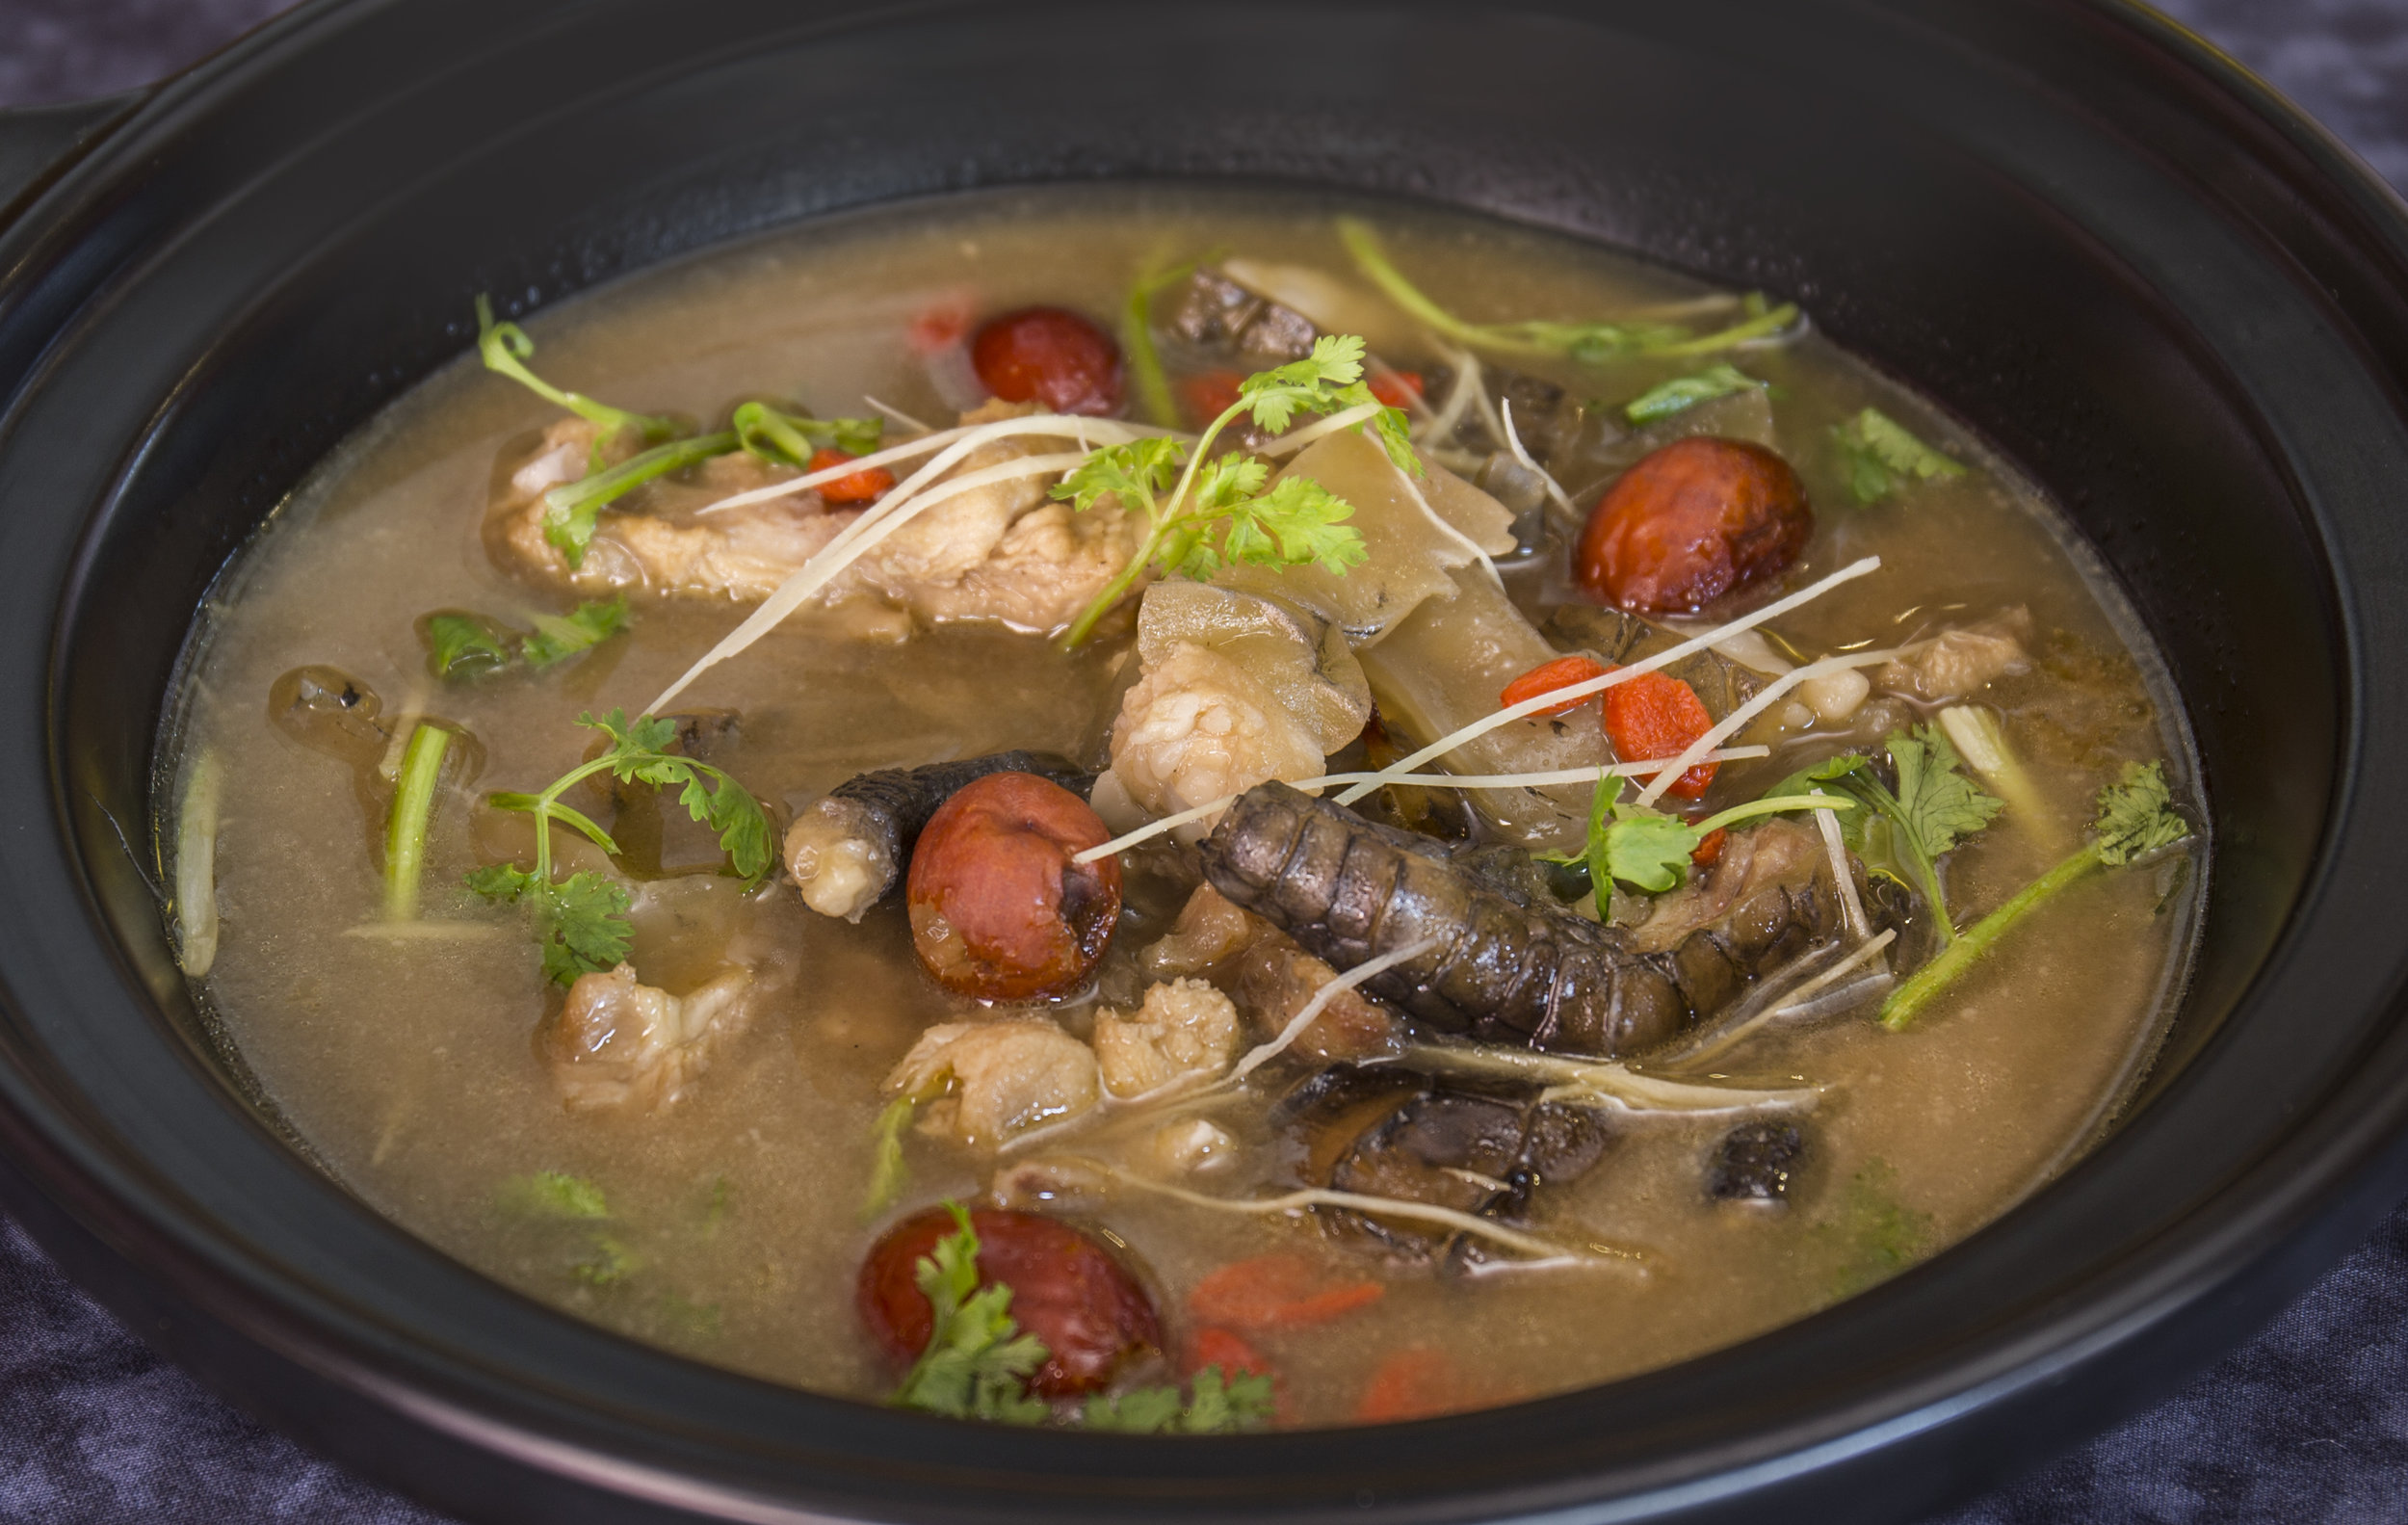 CQ_EastTreasure_Double-Boiled-Tonic-Soup-w-Crocodile-Meat.jpg